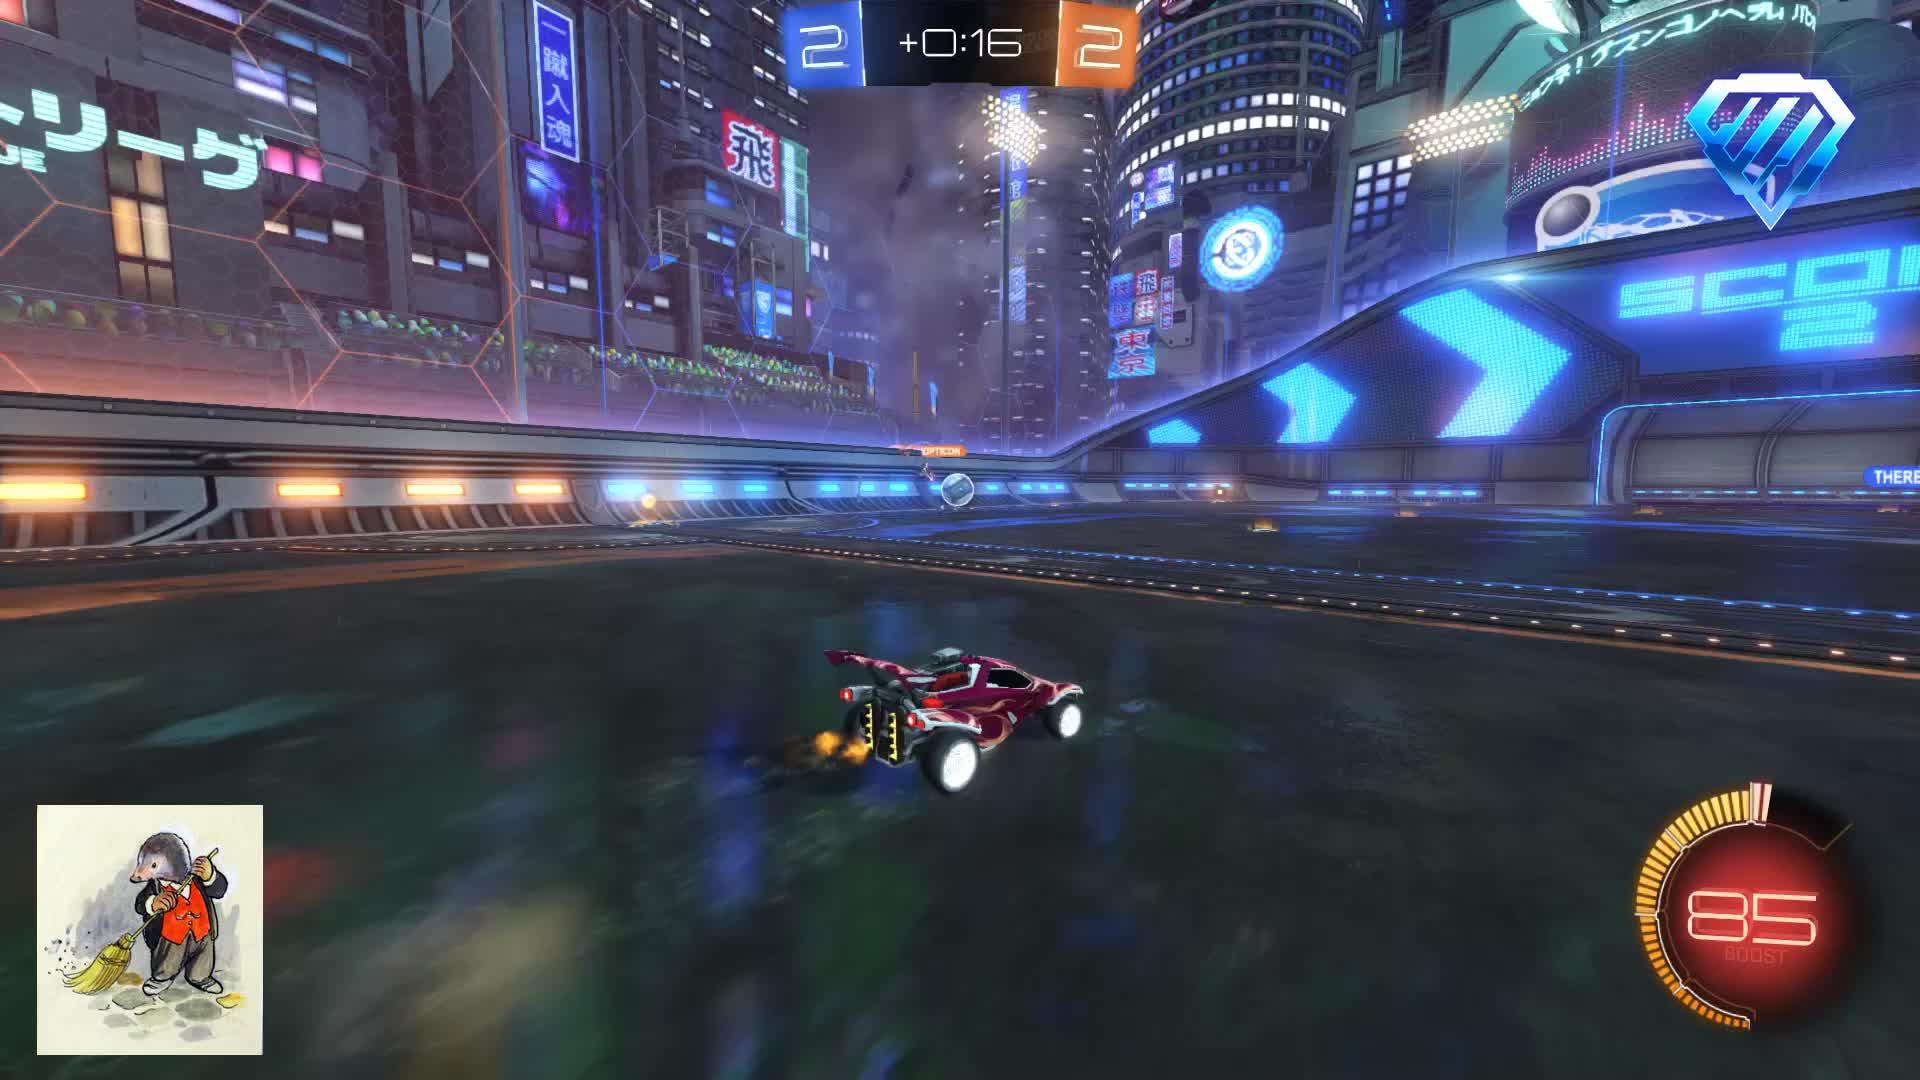 Gif Your Game, GifYourGame, Goal, Moly17, Rocket League, RocketLeague, Goal 5: Moly17 GIFs